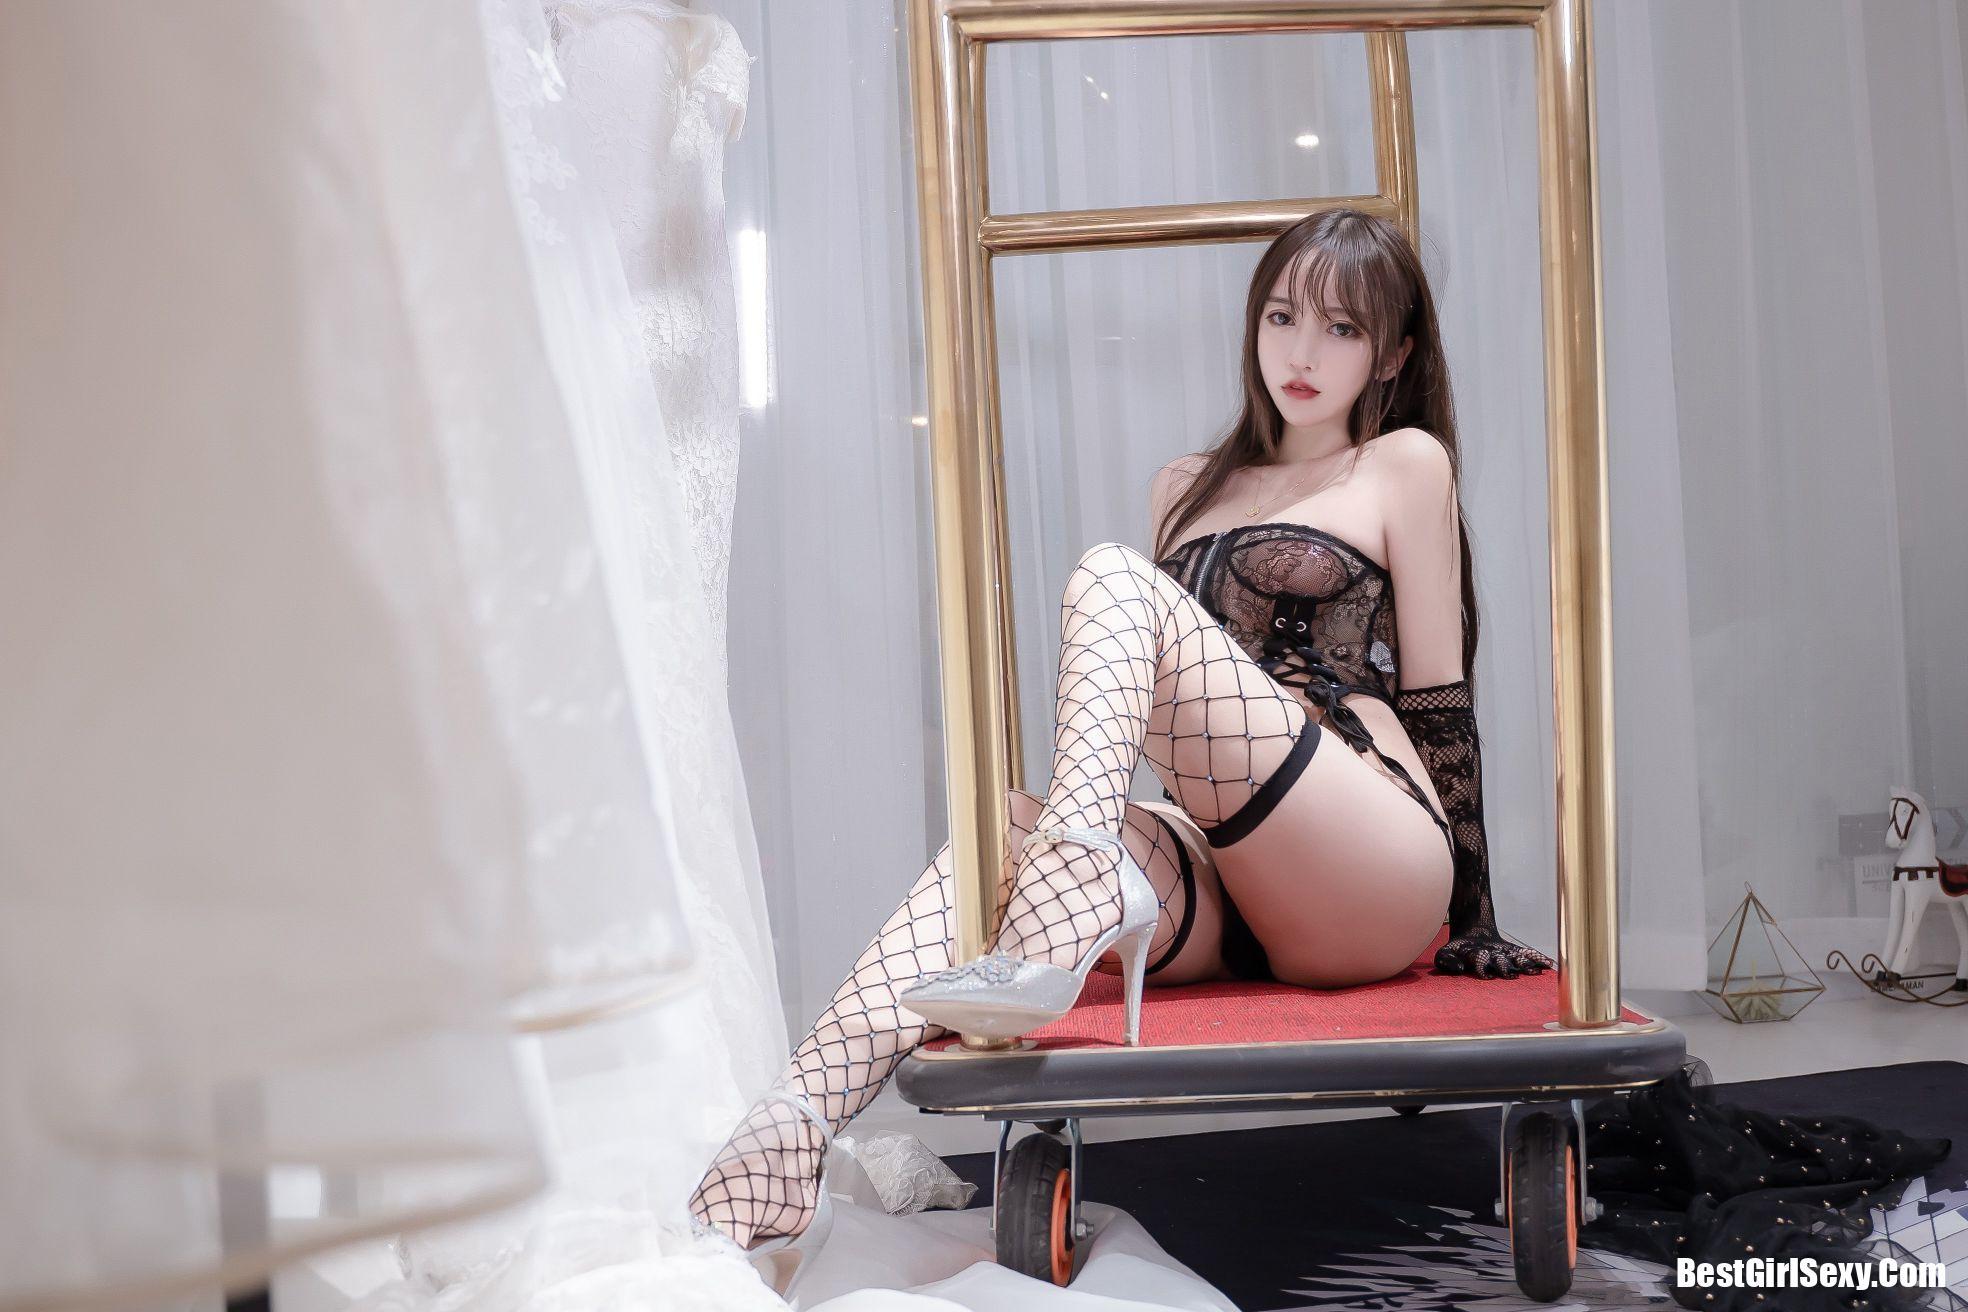 Coser@过期米线线喵 诡夜妖猫 - Best Girl Sexy